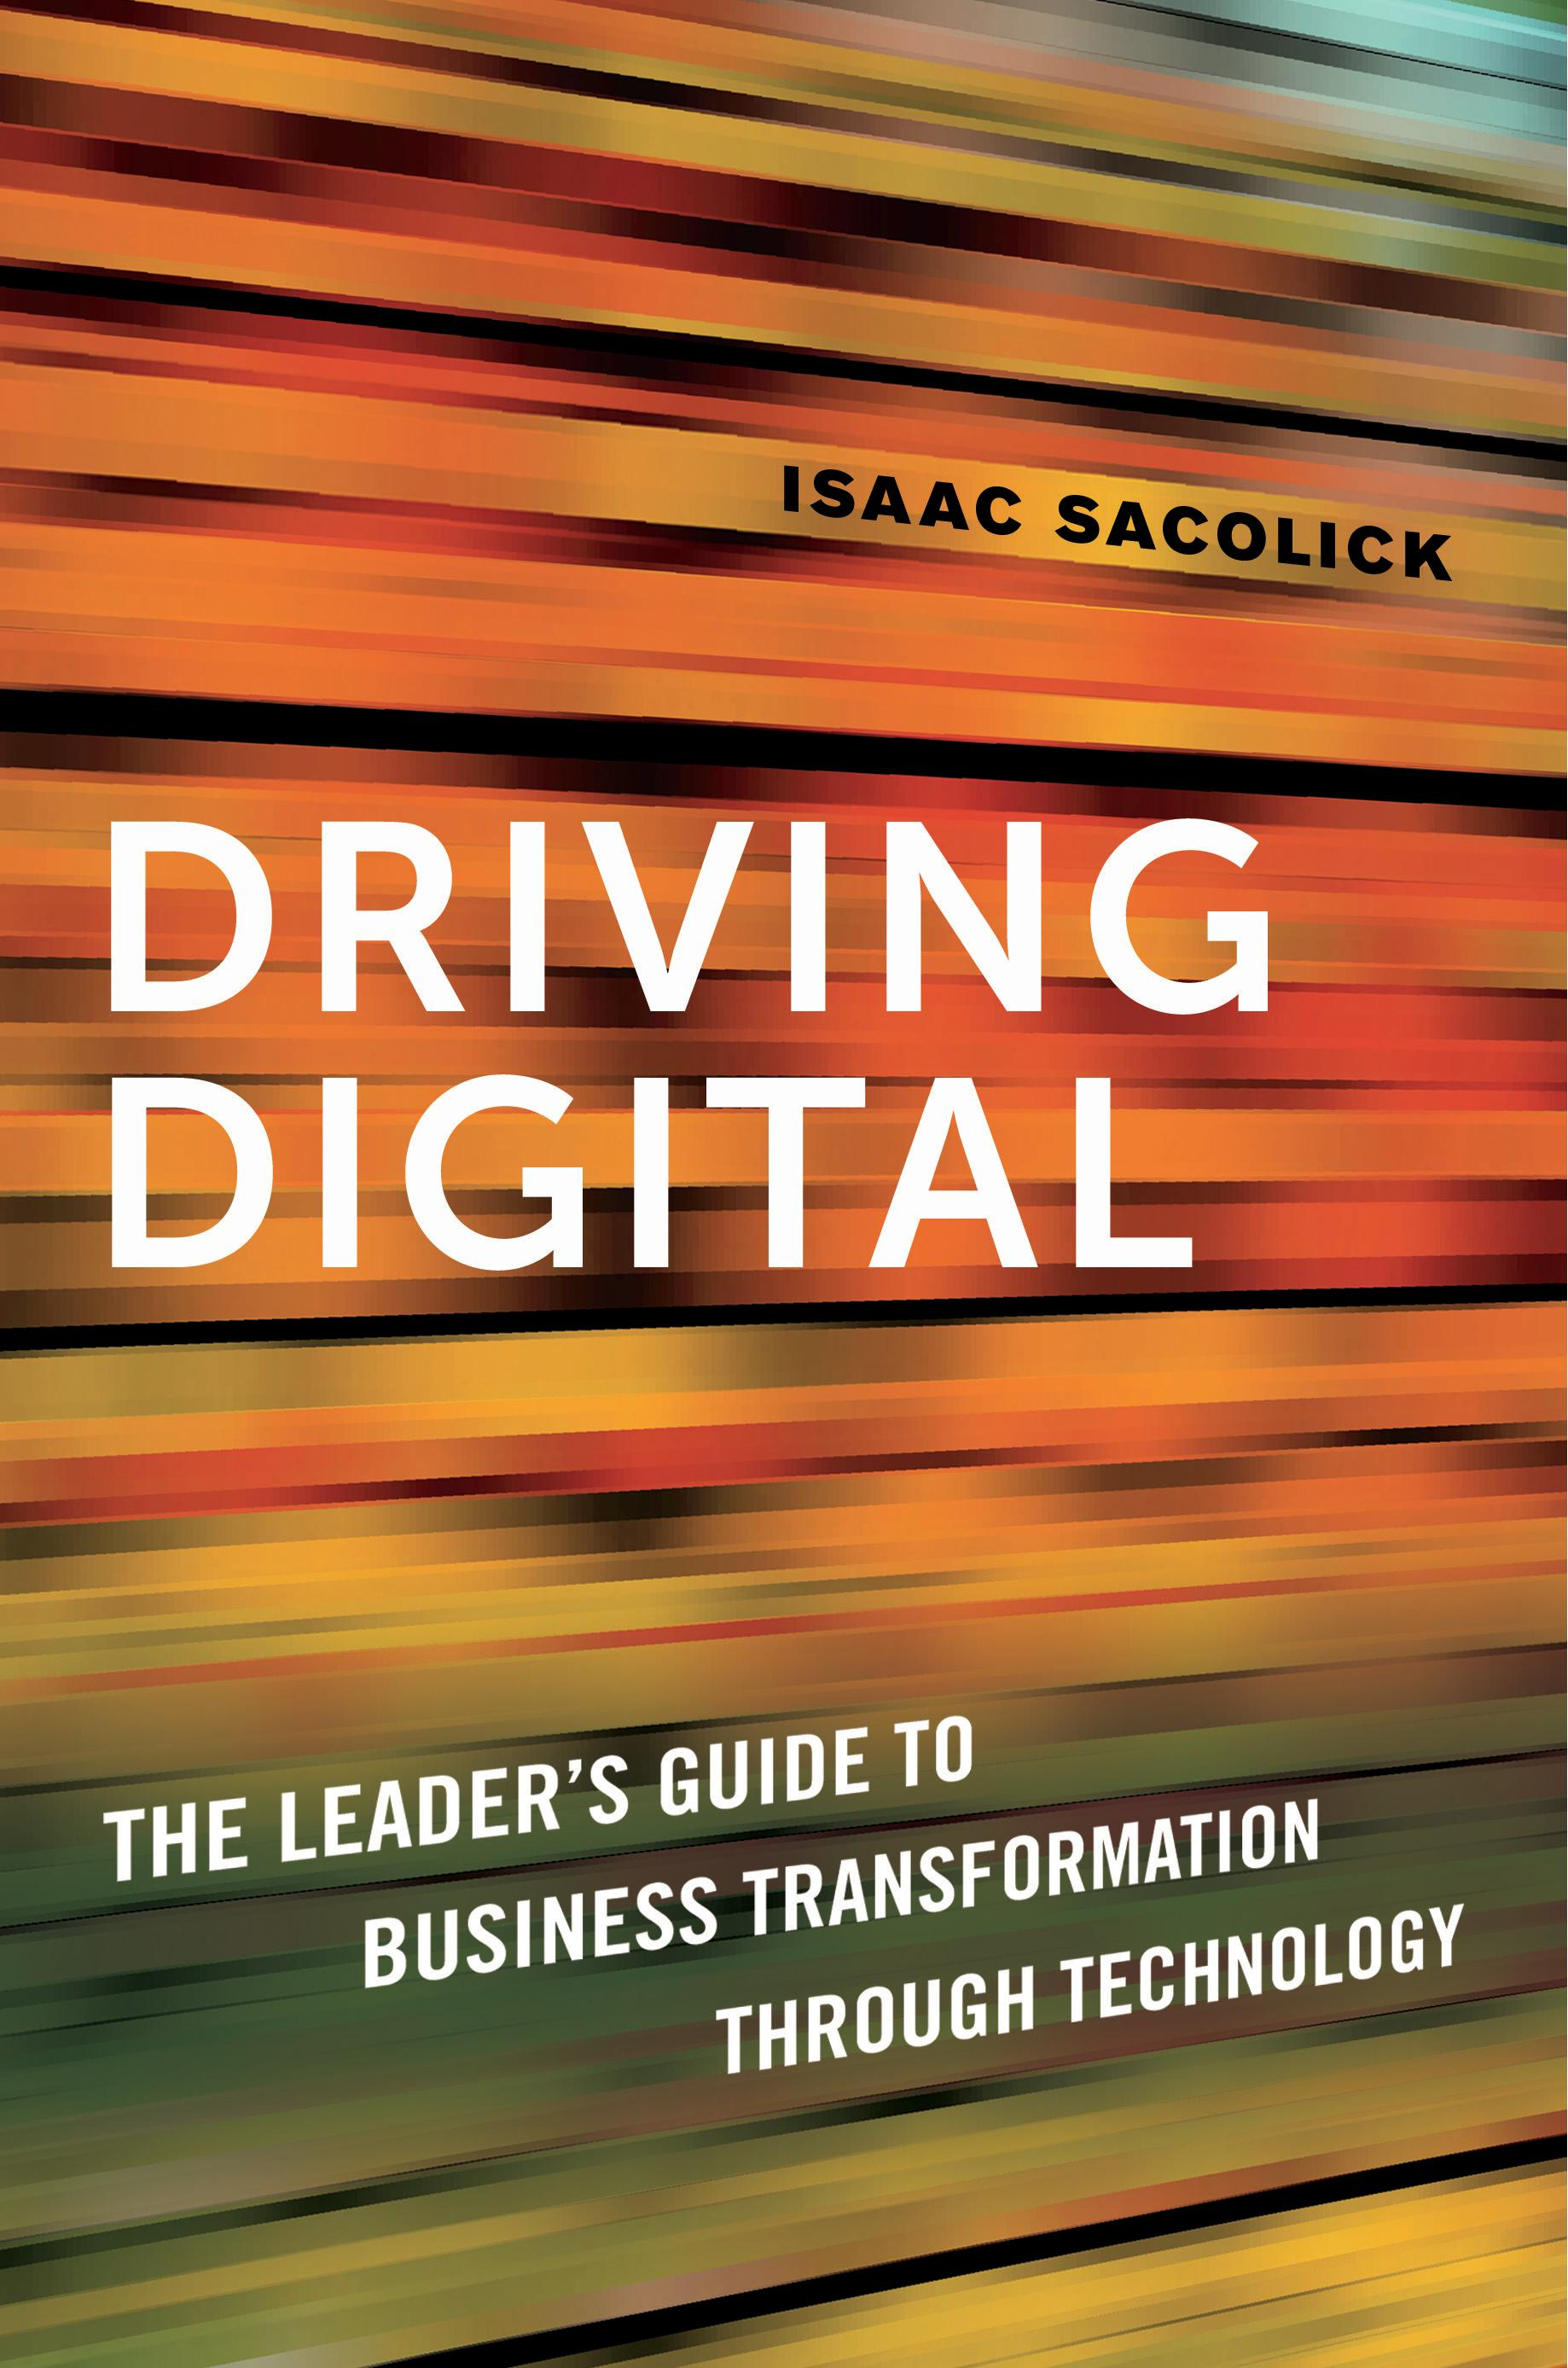 Copy of Driving Digital